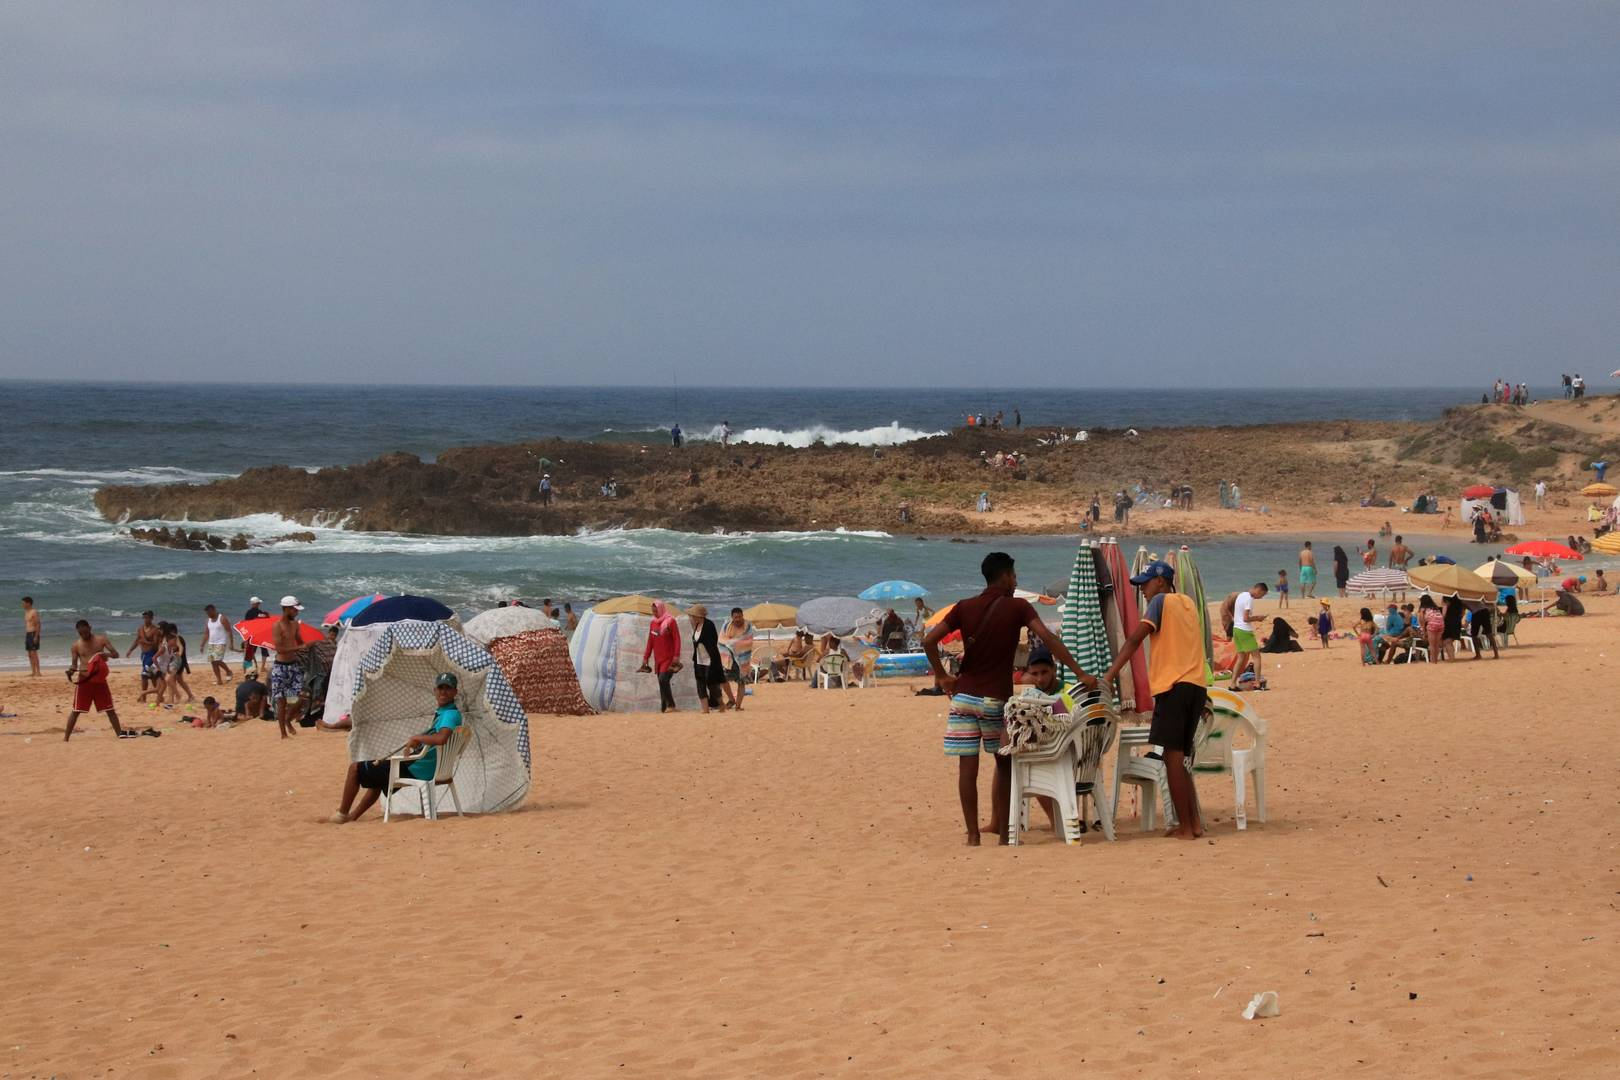 Maroc - Plage de Oualidia